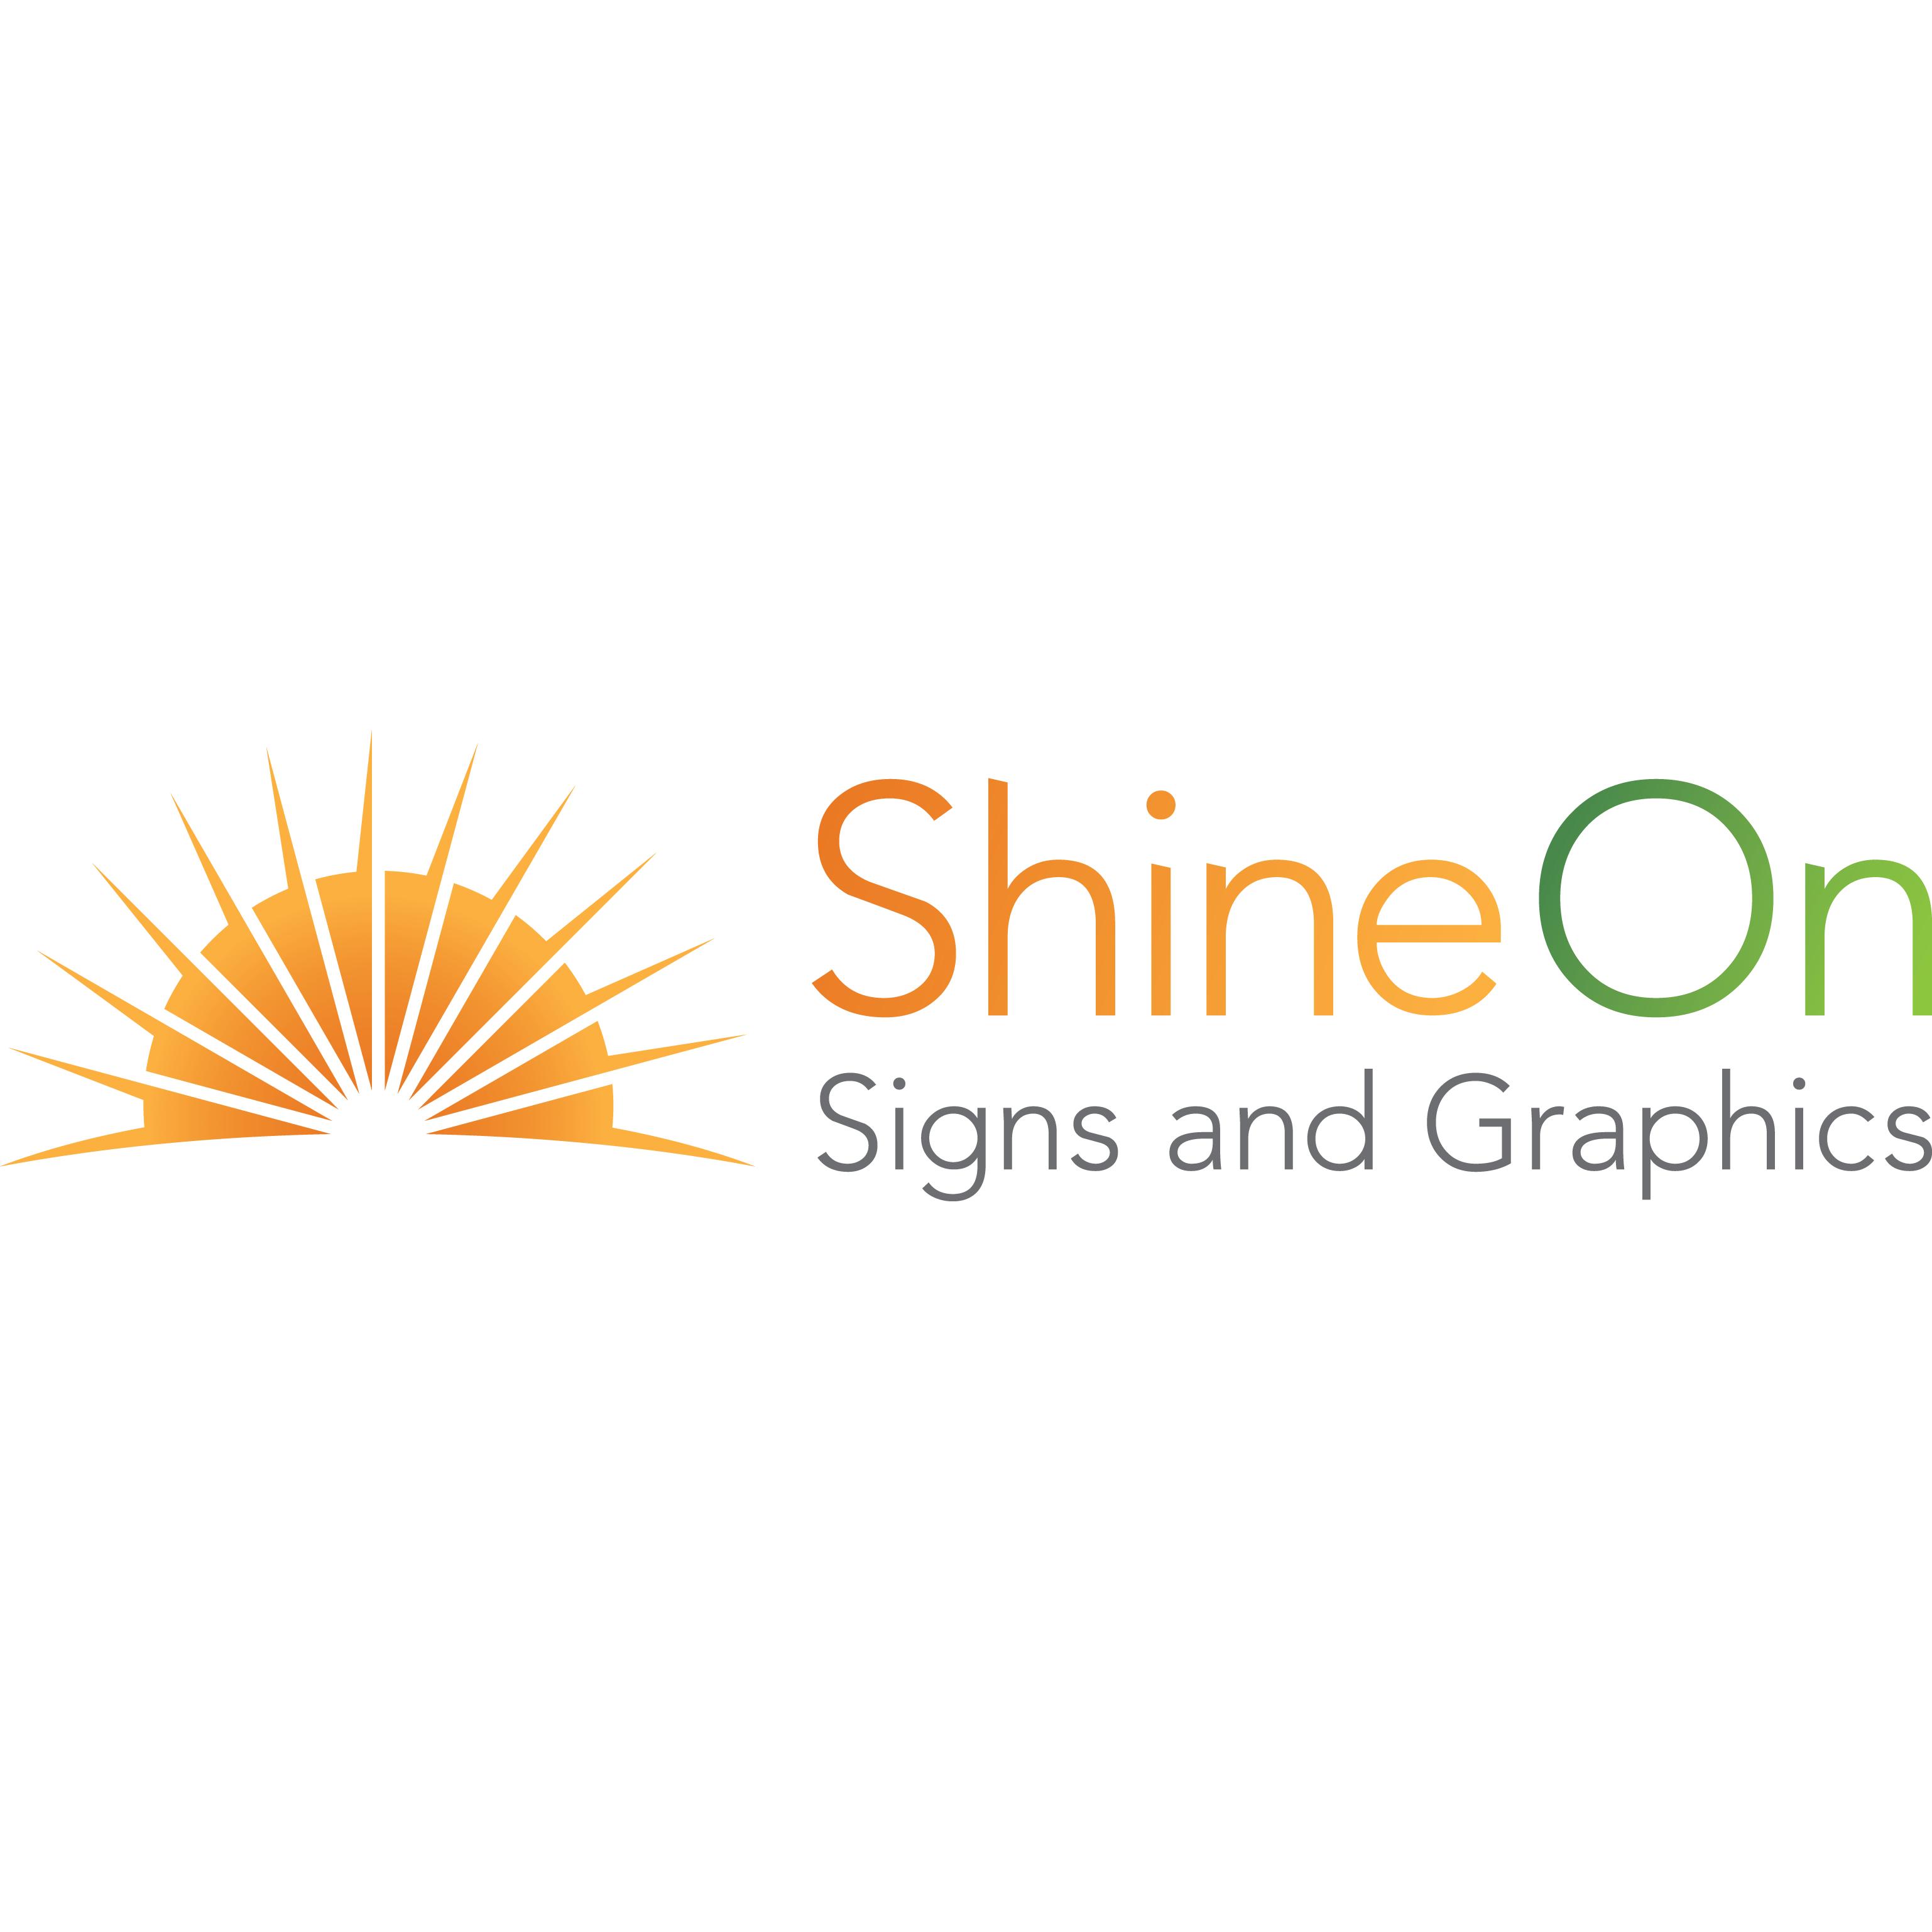 Shine On Signs and Graphics - Renton, WA 98057 - (253)243-7777   ShowMeLocal.com